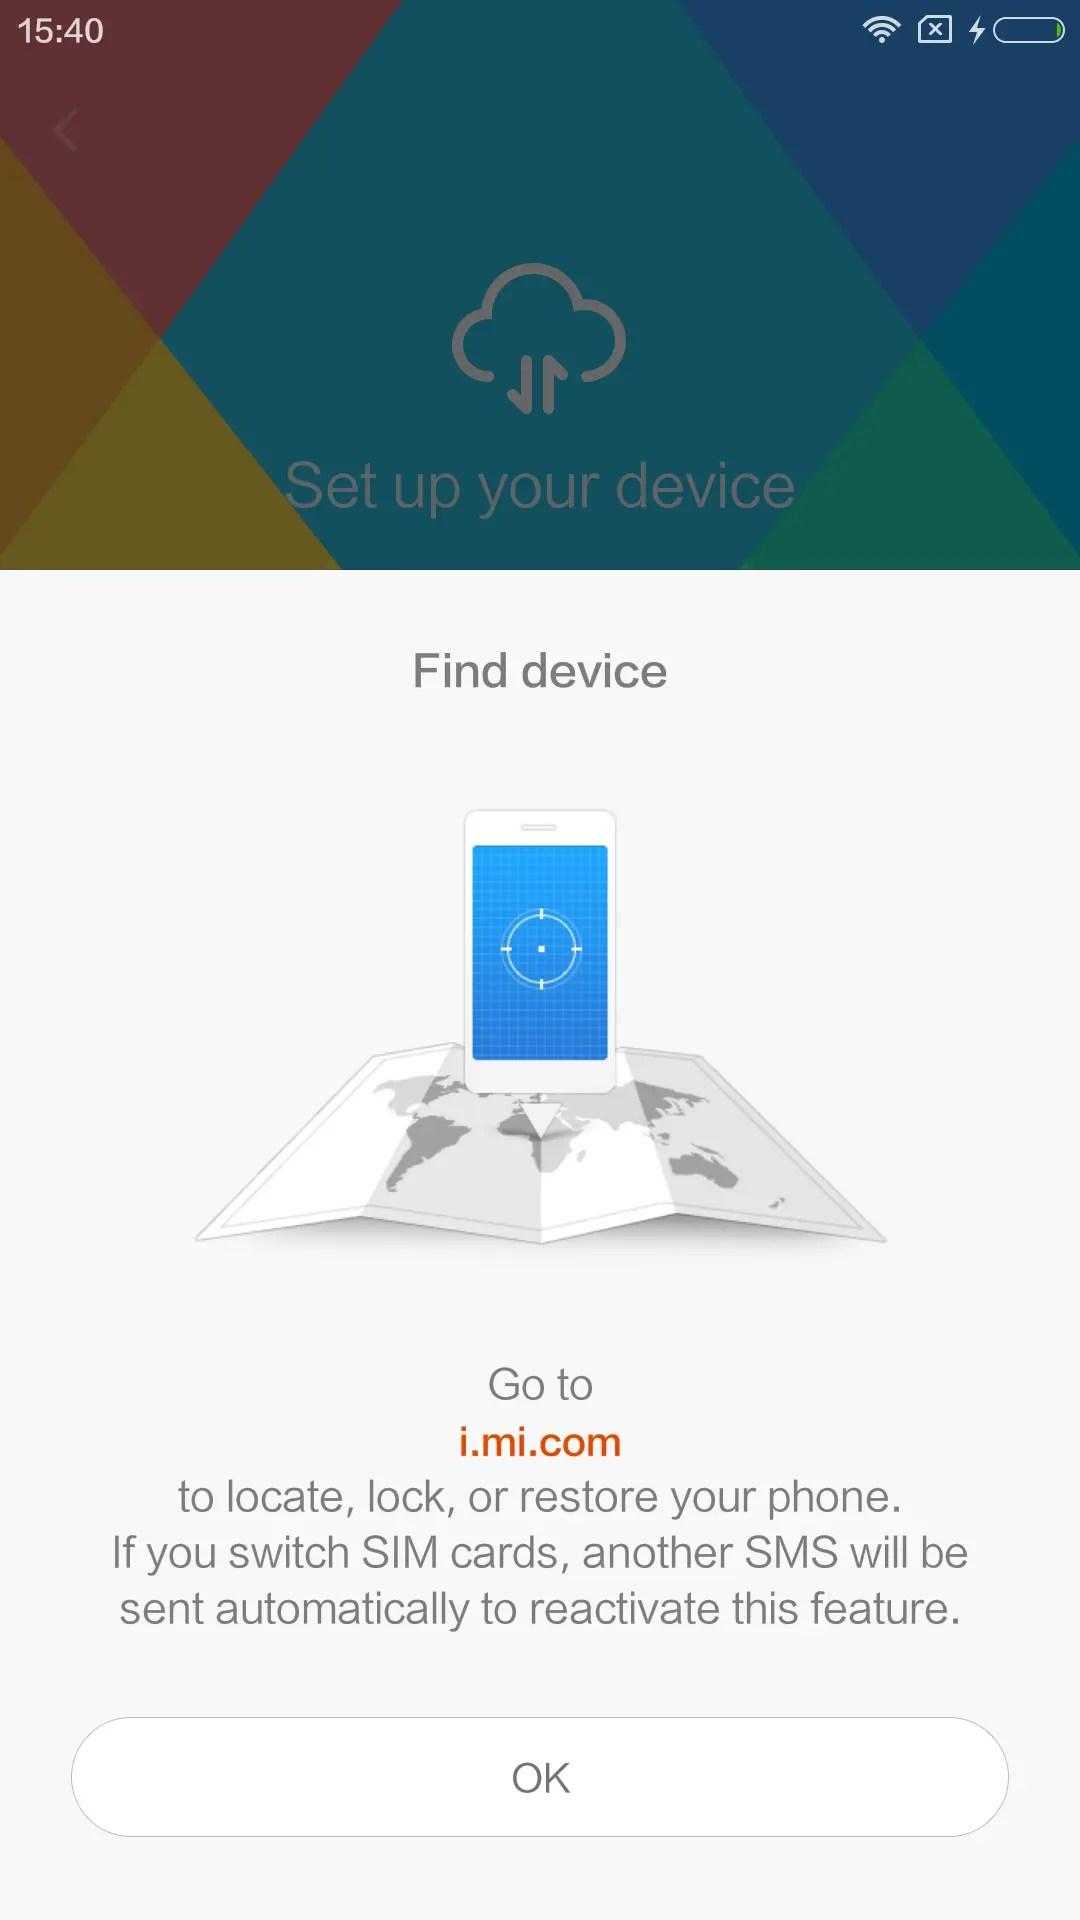 Find deviceのページはi.,mi.com